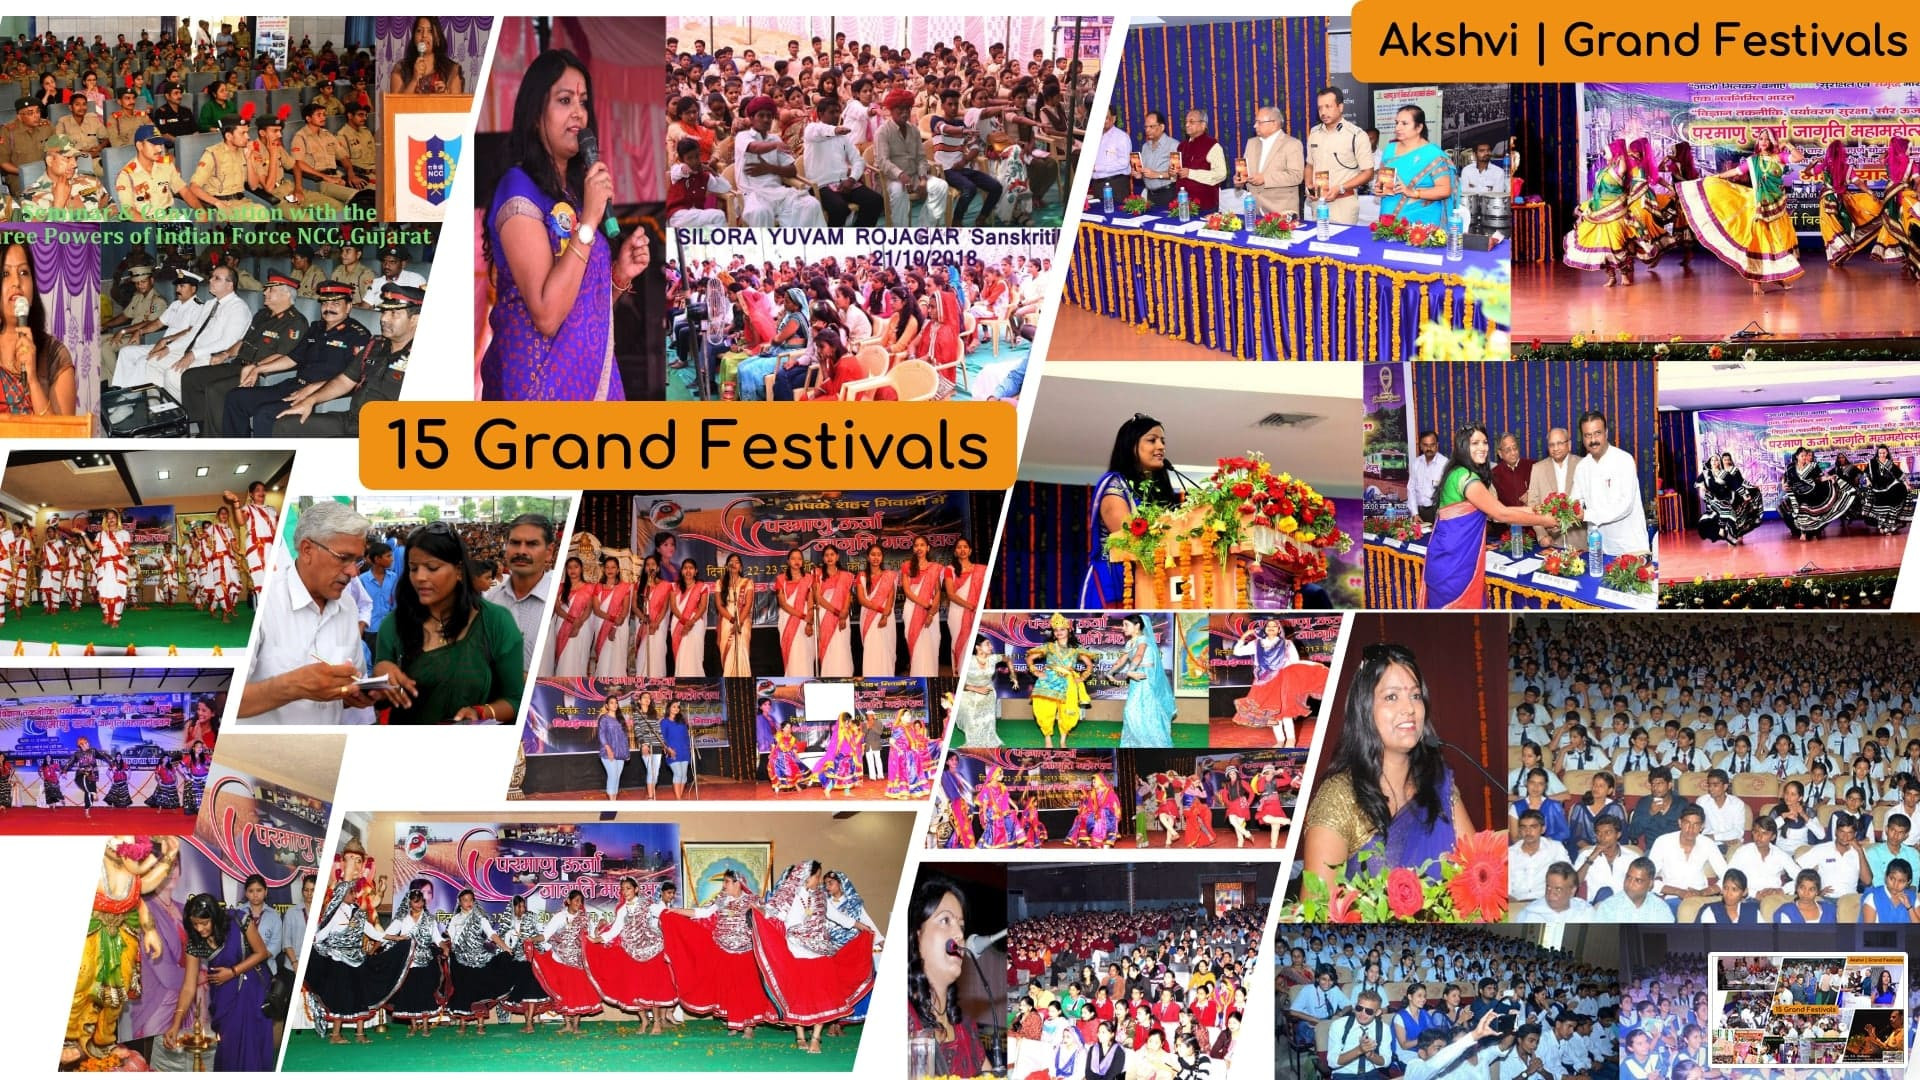 Grand Festivals - Bharat kee Parmanu Saheli